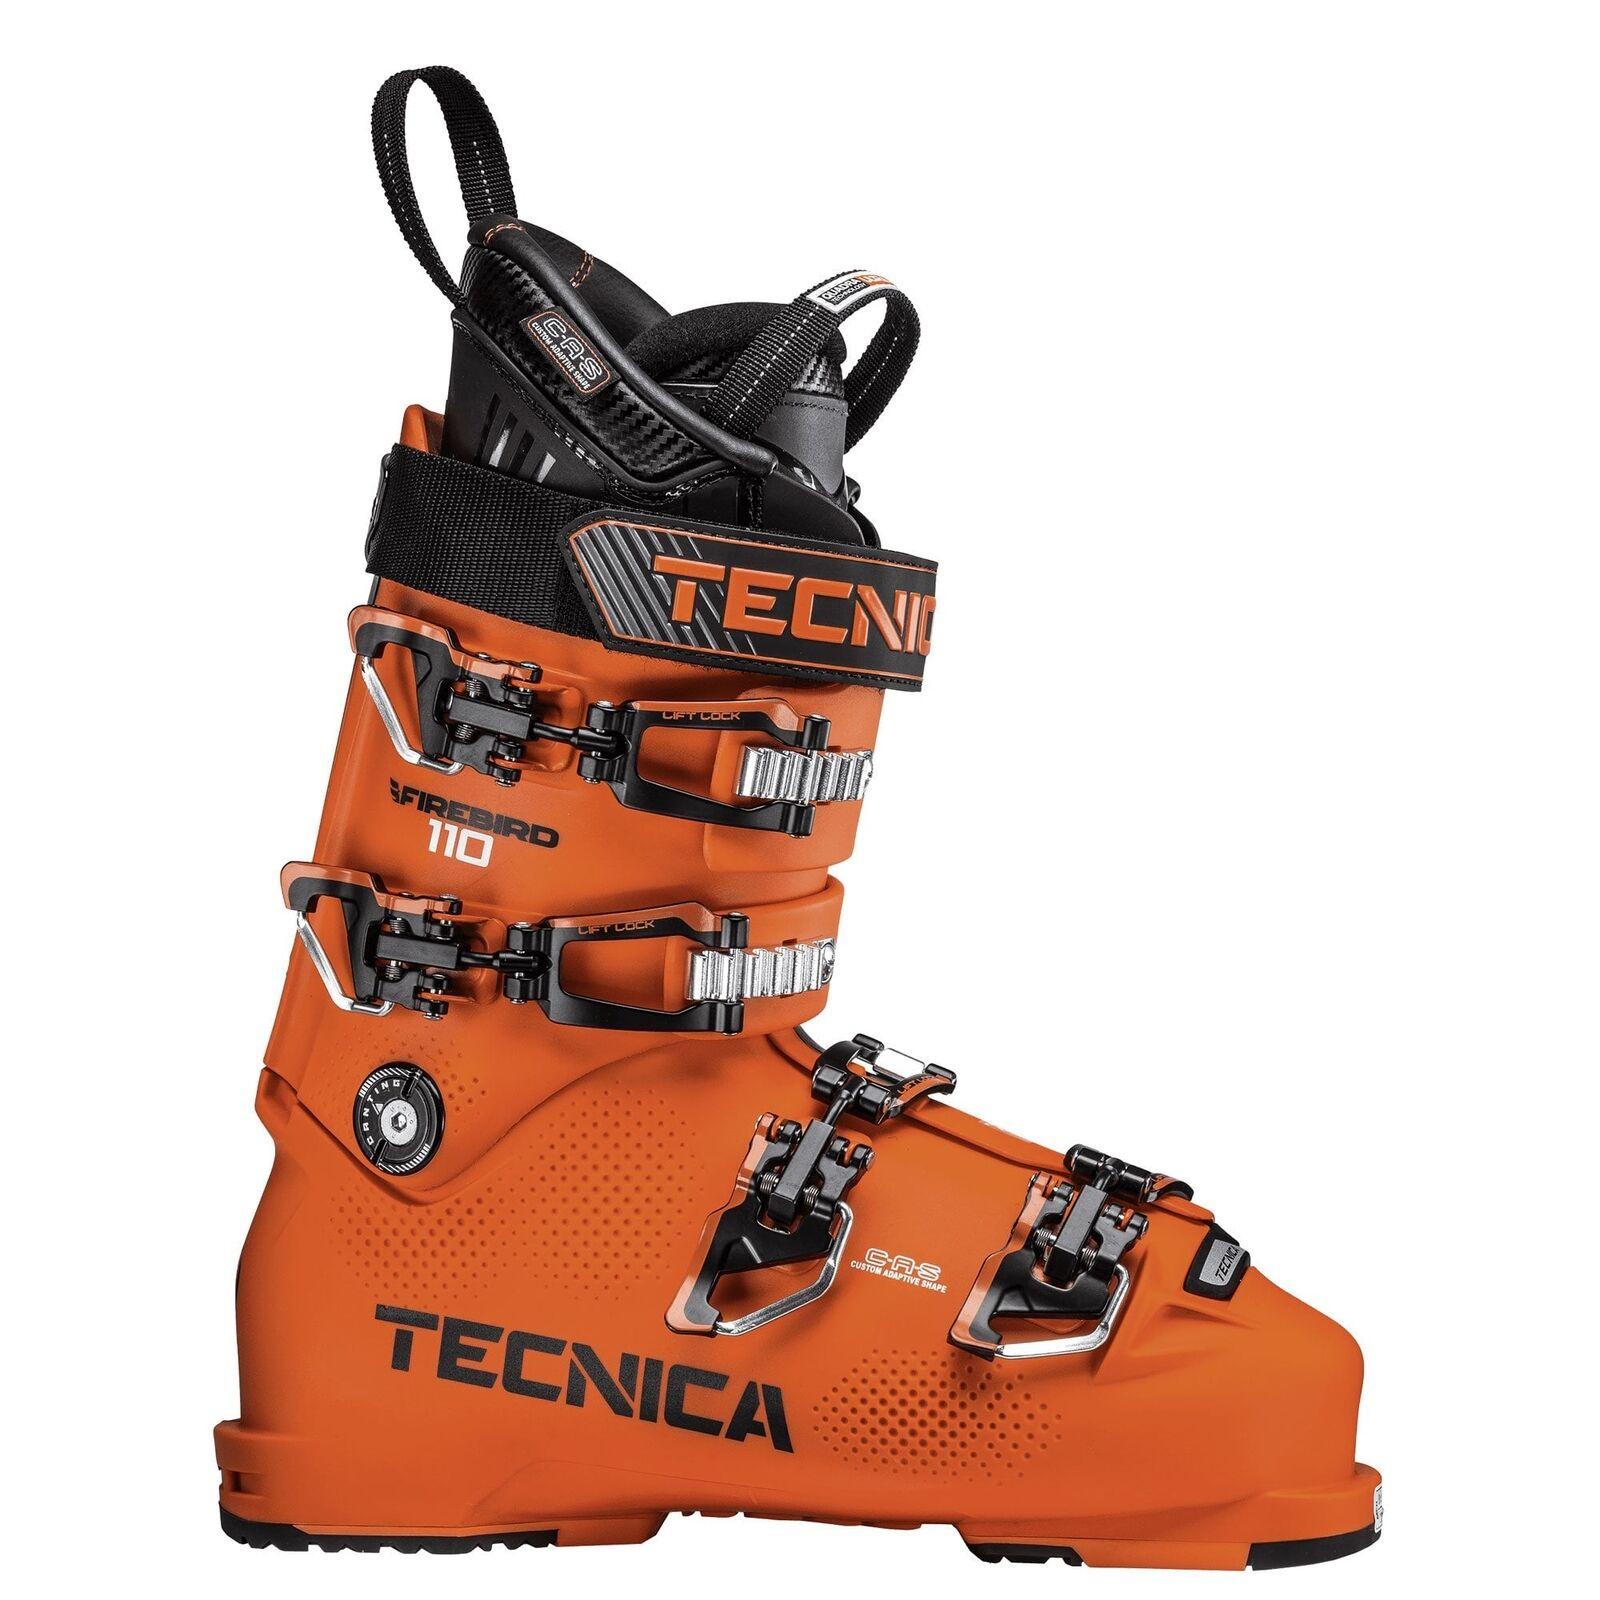 Tecnica Firebird 110 Ski Stiefel